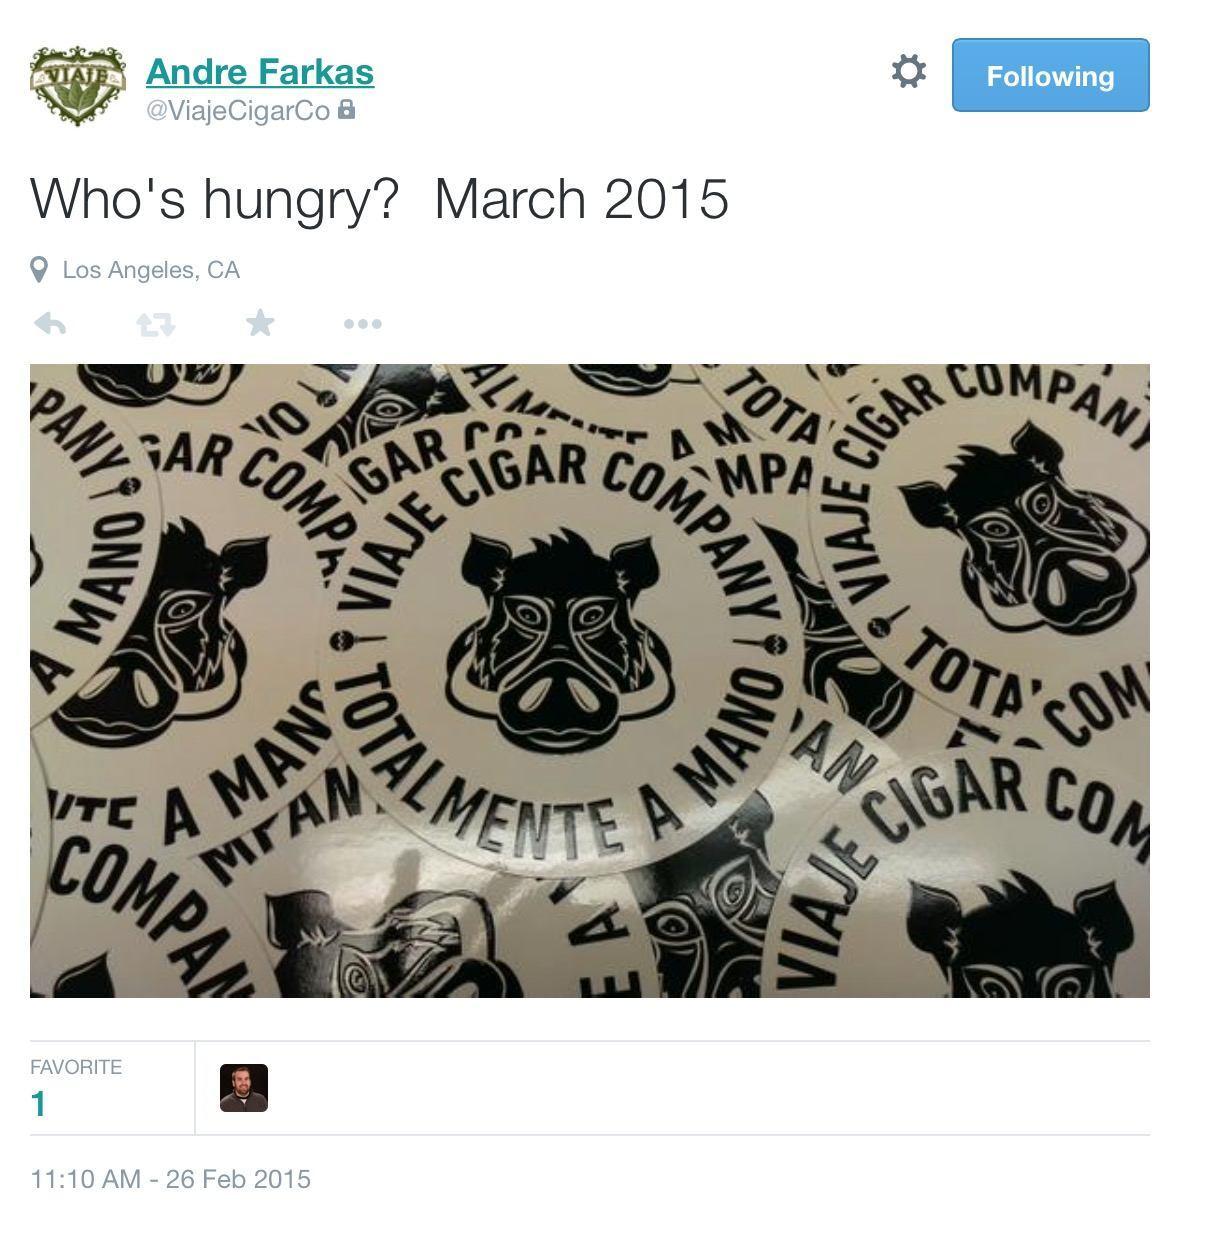 Viaje March 2015 Tweet